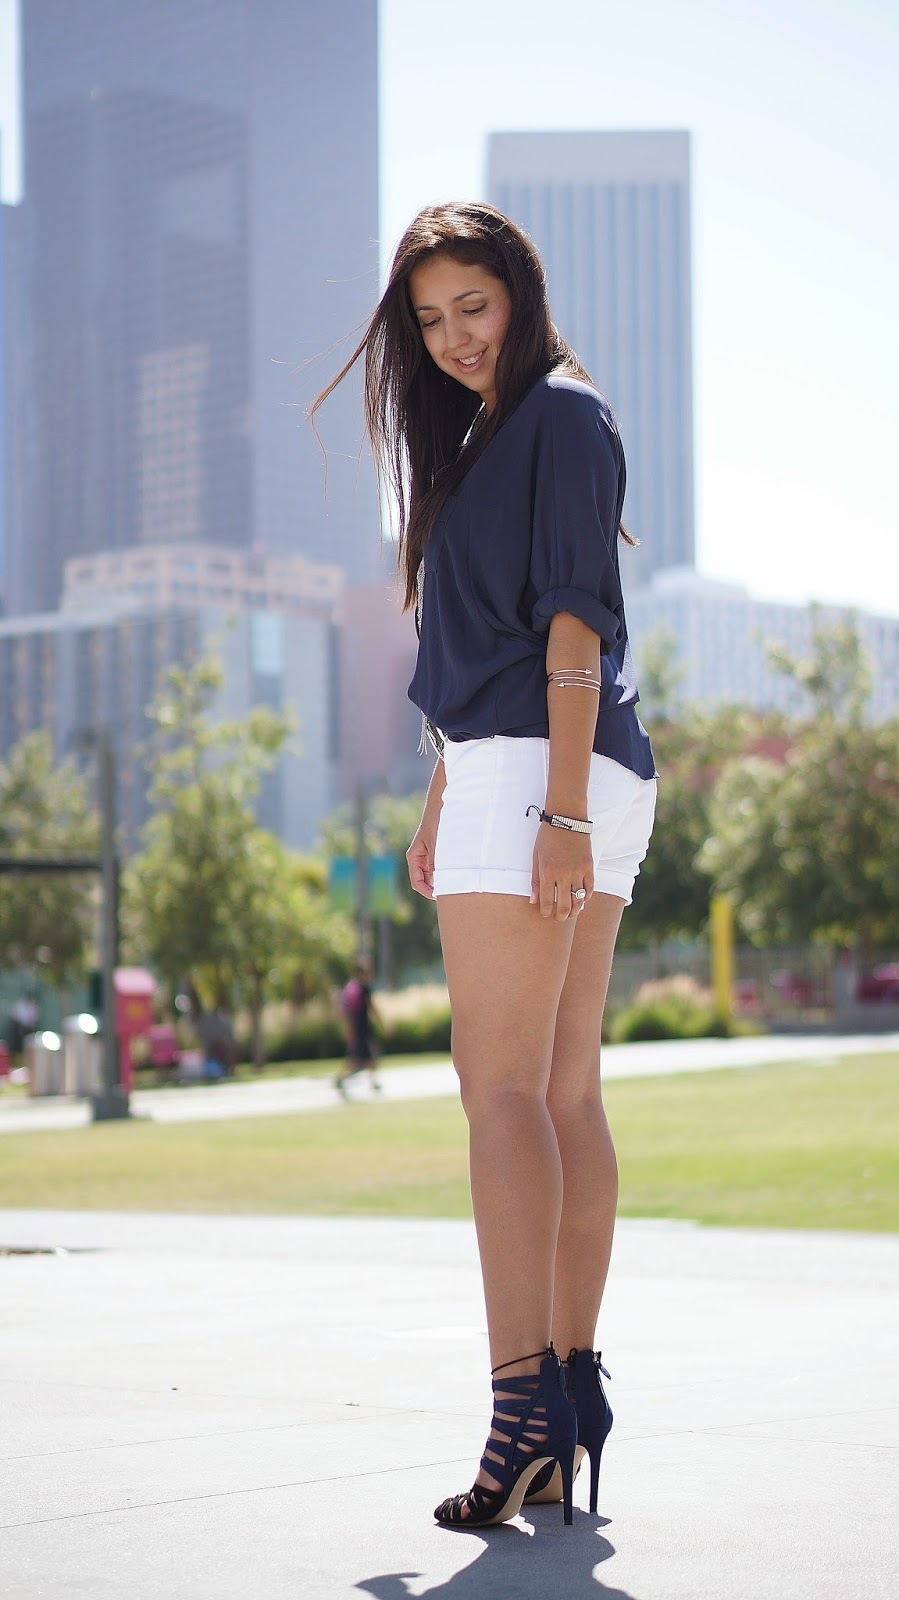 Levi's Roll Cuff White Shorts, Summer Fashion, Fashion Blogger, Zara Heels, Casual Look, Downtown LA